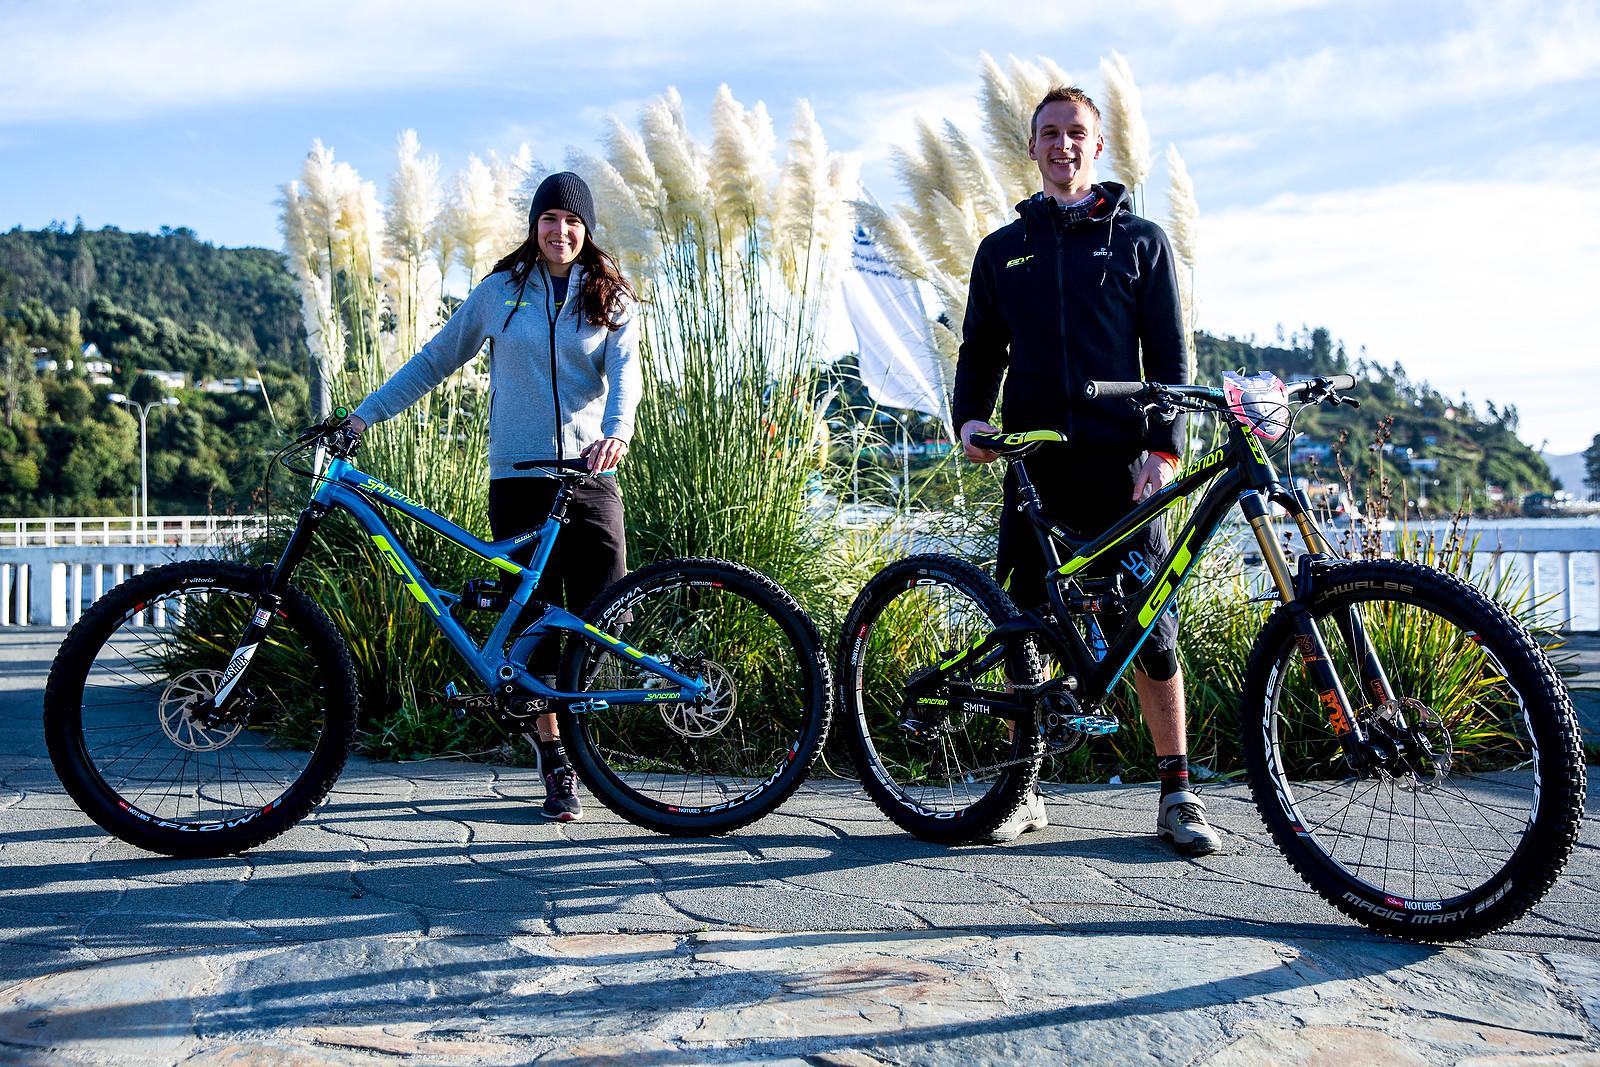 Anneke Beerten and Martin Maes - PIT BITS - Enduro World Series, Corral, Chile - Mountain Biking Pictures - Vital MTB